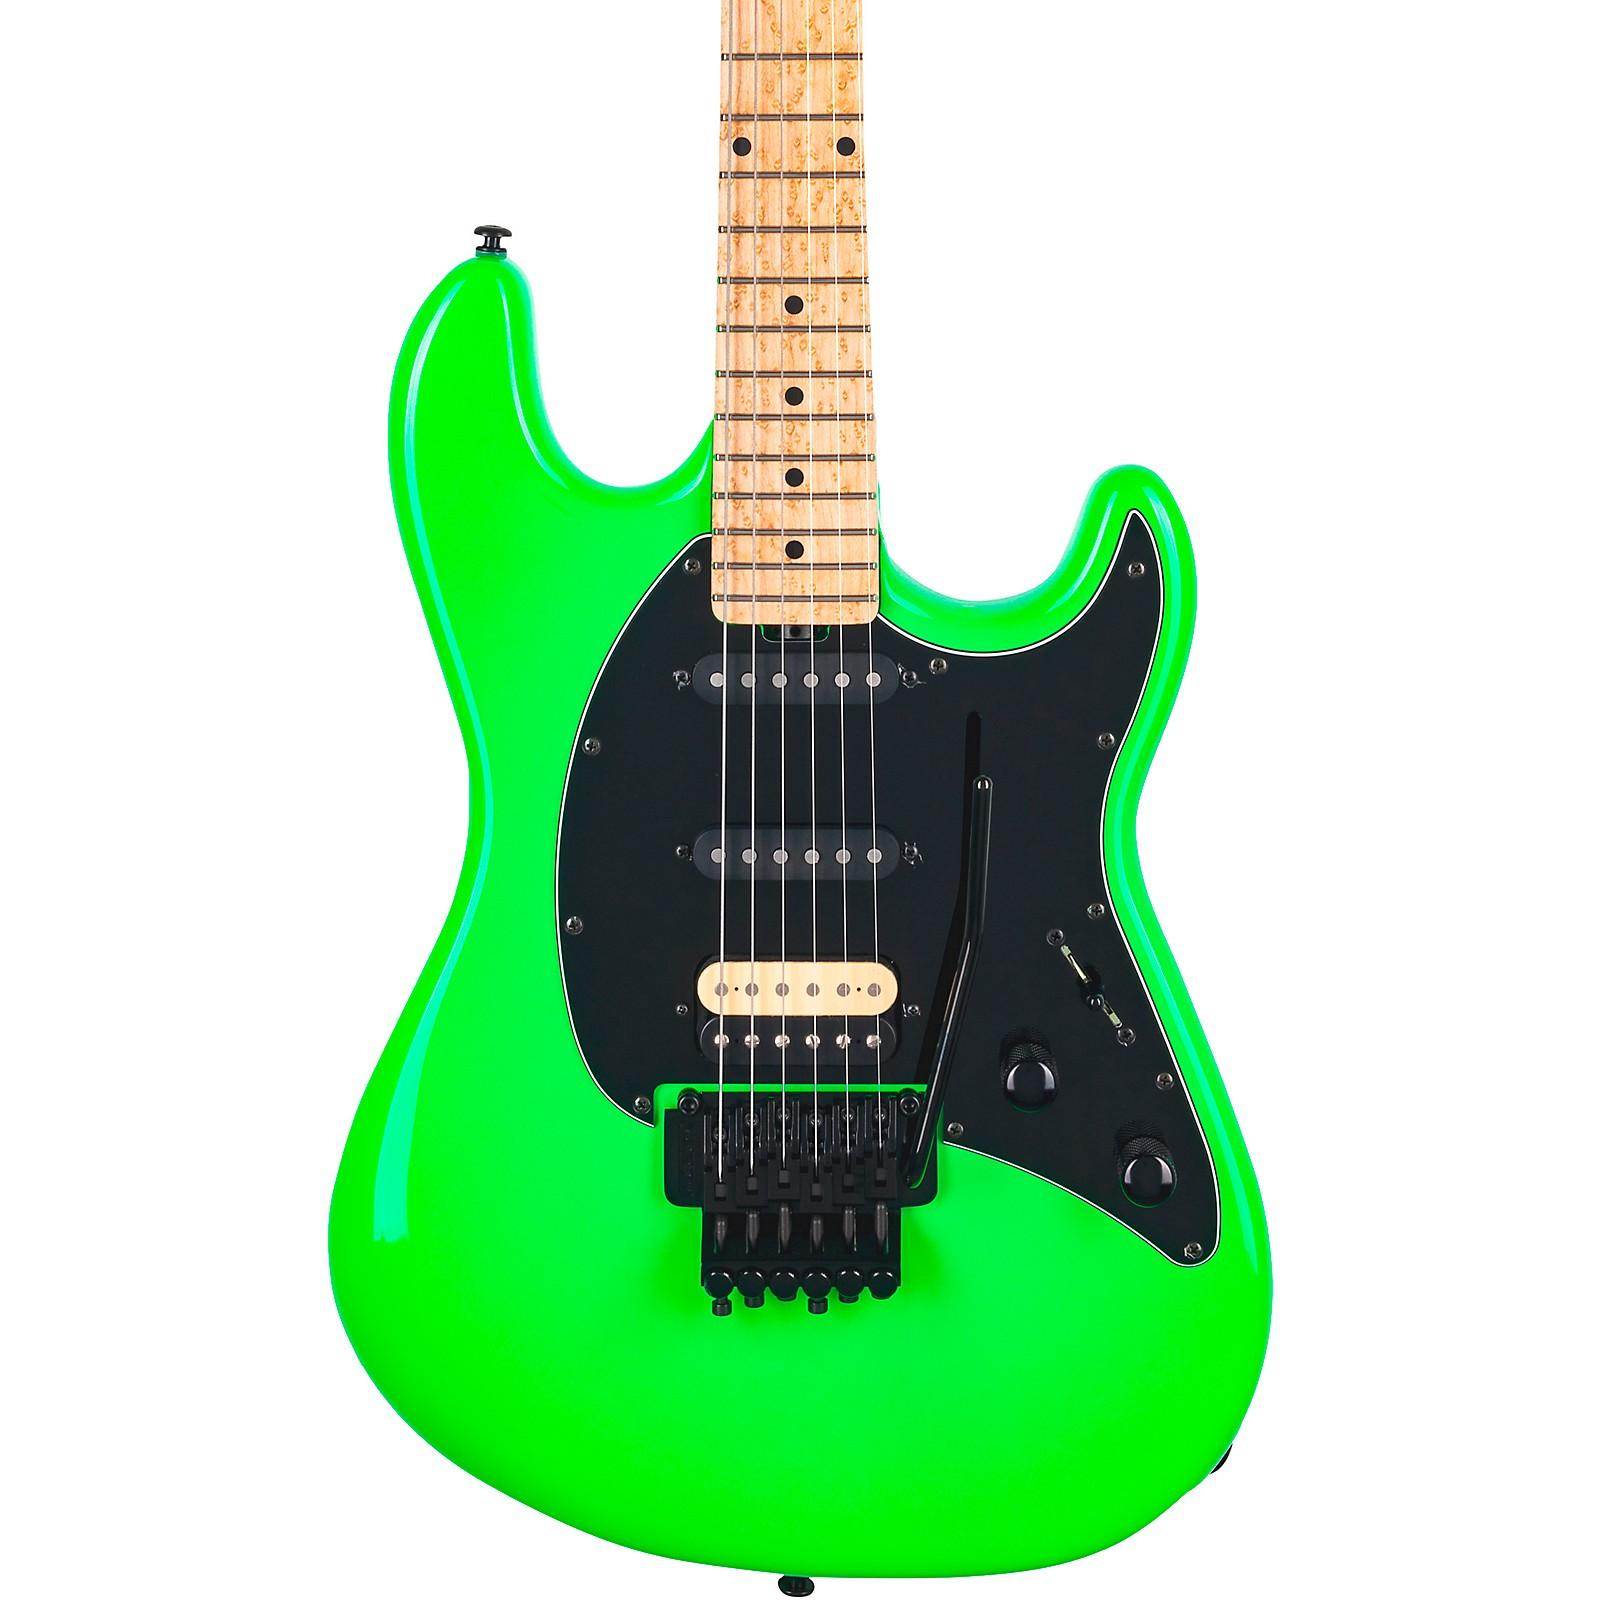 Ernie Ball Music Man Cutlass Floyd HSS BFR Electric Guitar